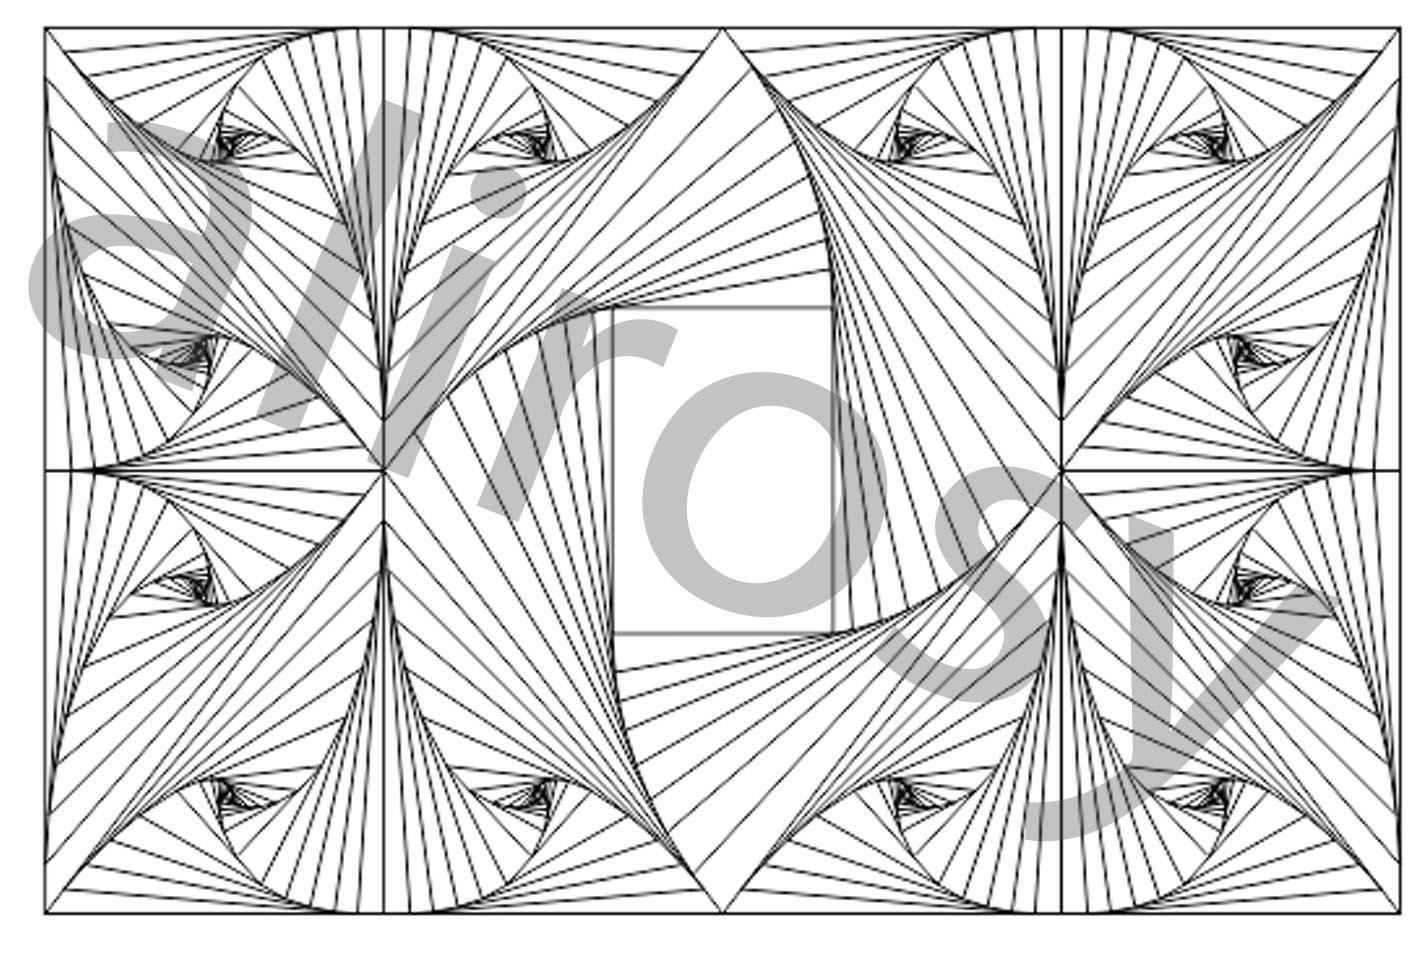 01 - طرح وکتور شبکه